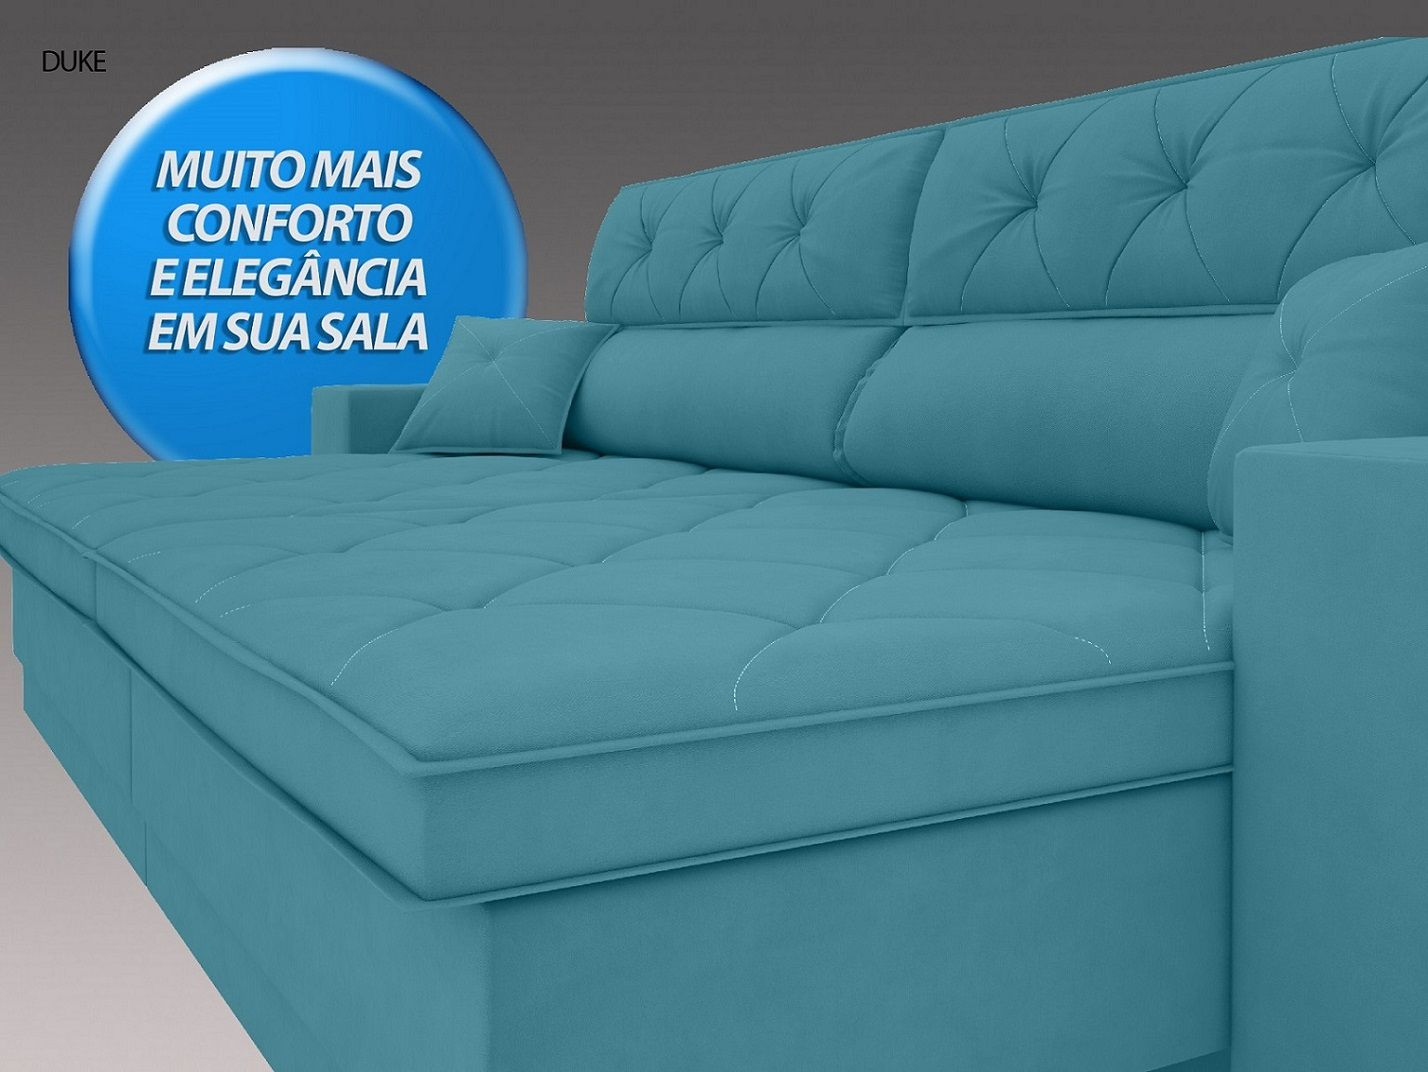 Sofá Duke 2,90m Retrátil e Reclinável Velosuede Turquesa  - NETSOFAS  - NETSOFÁS